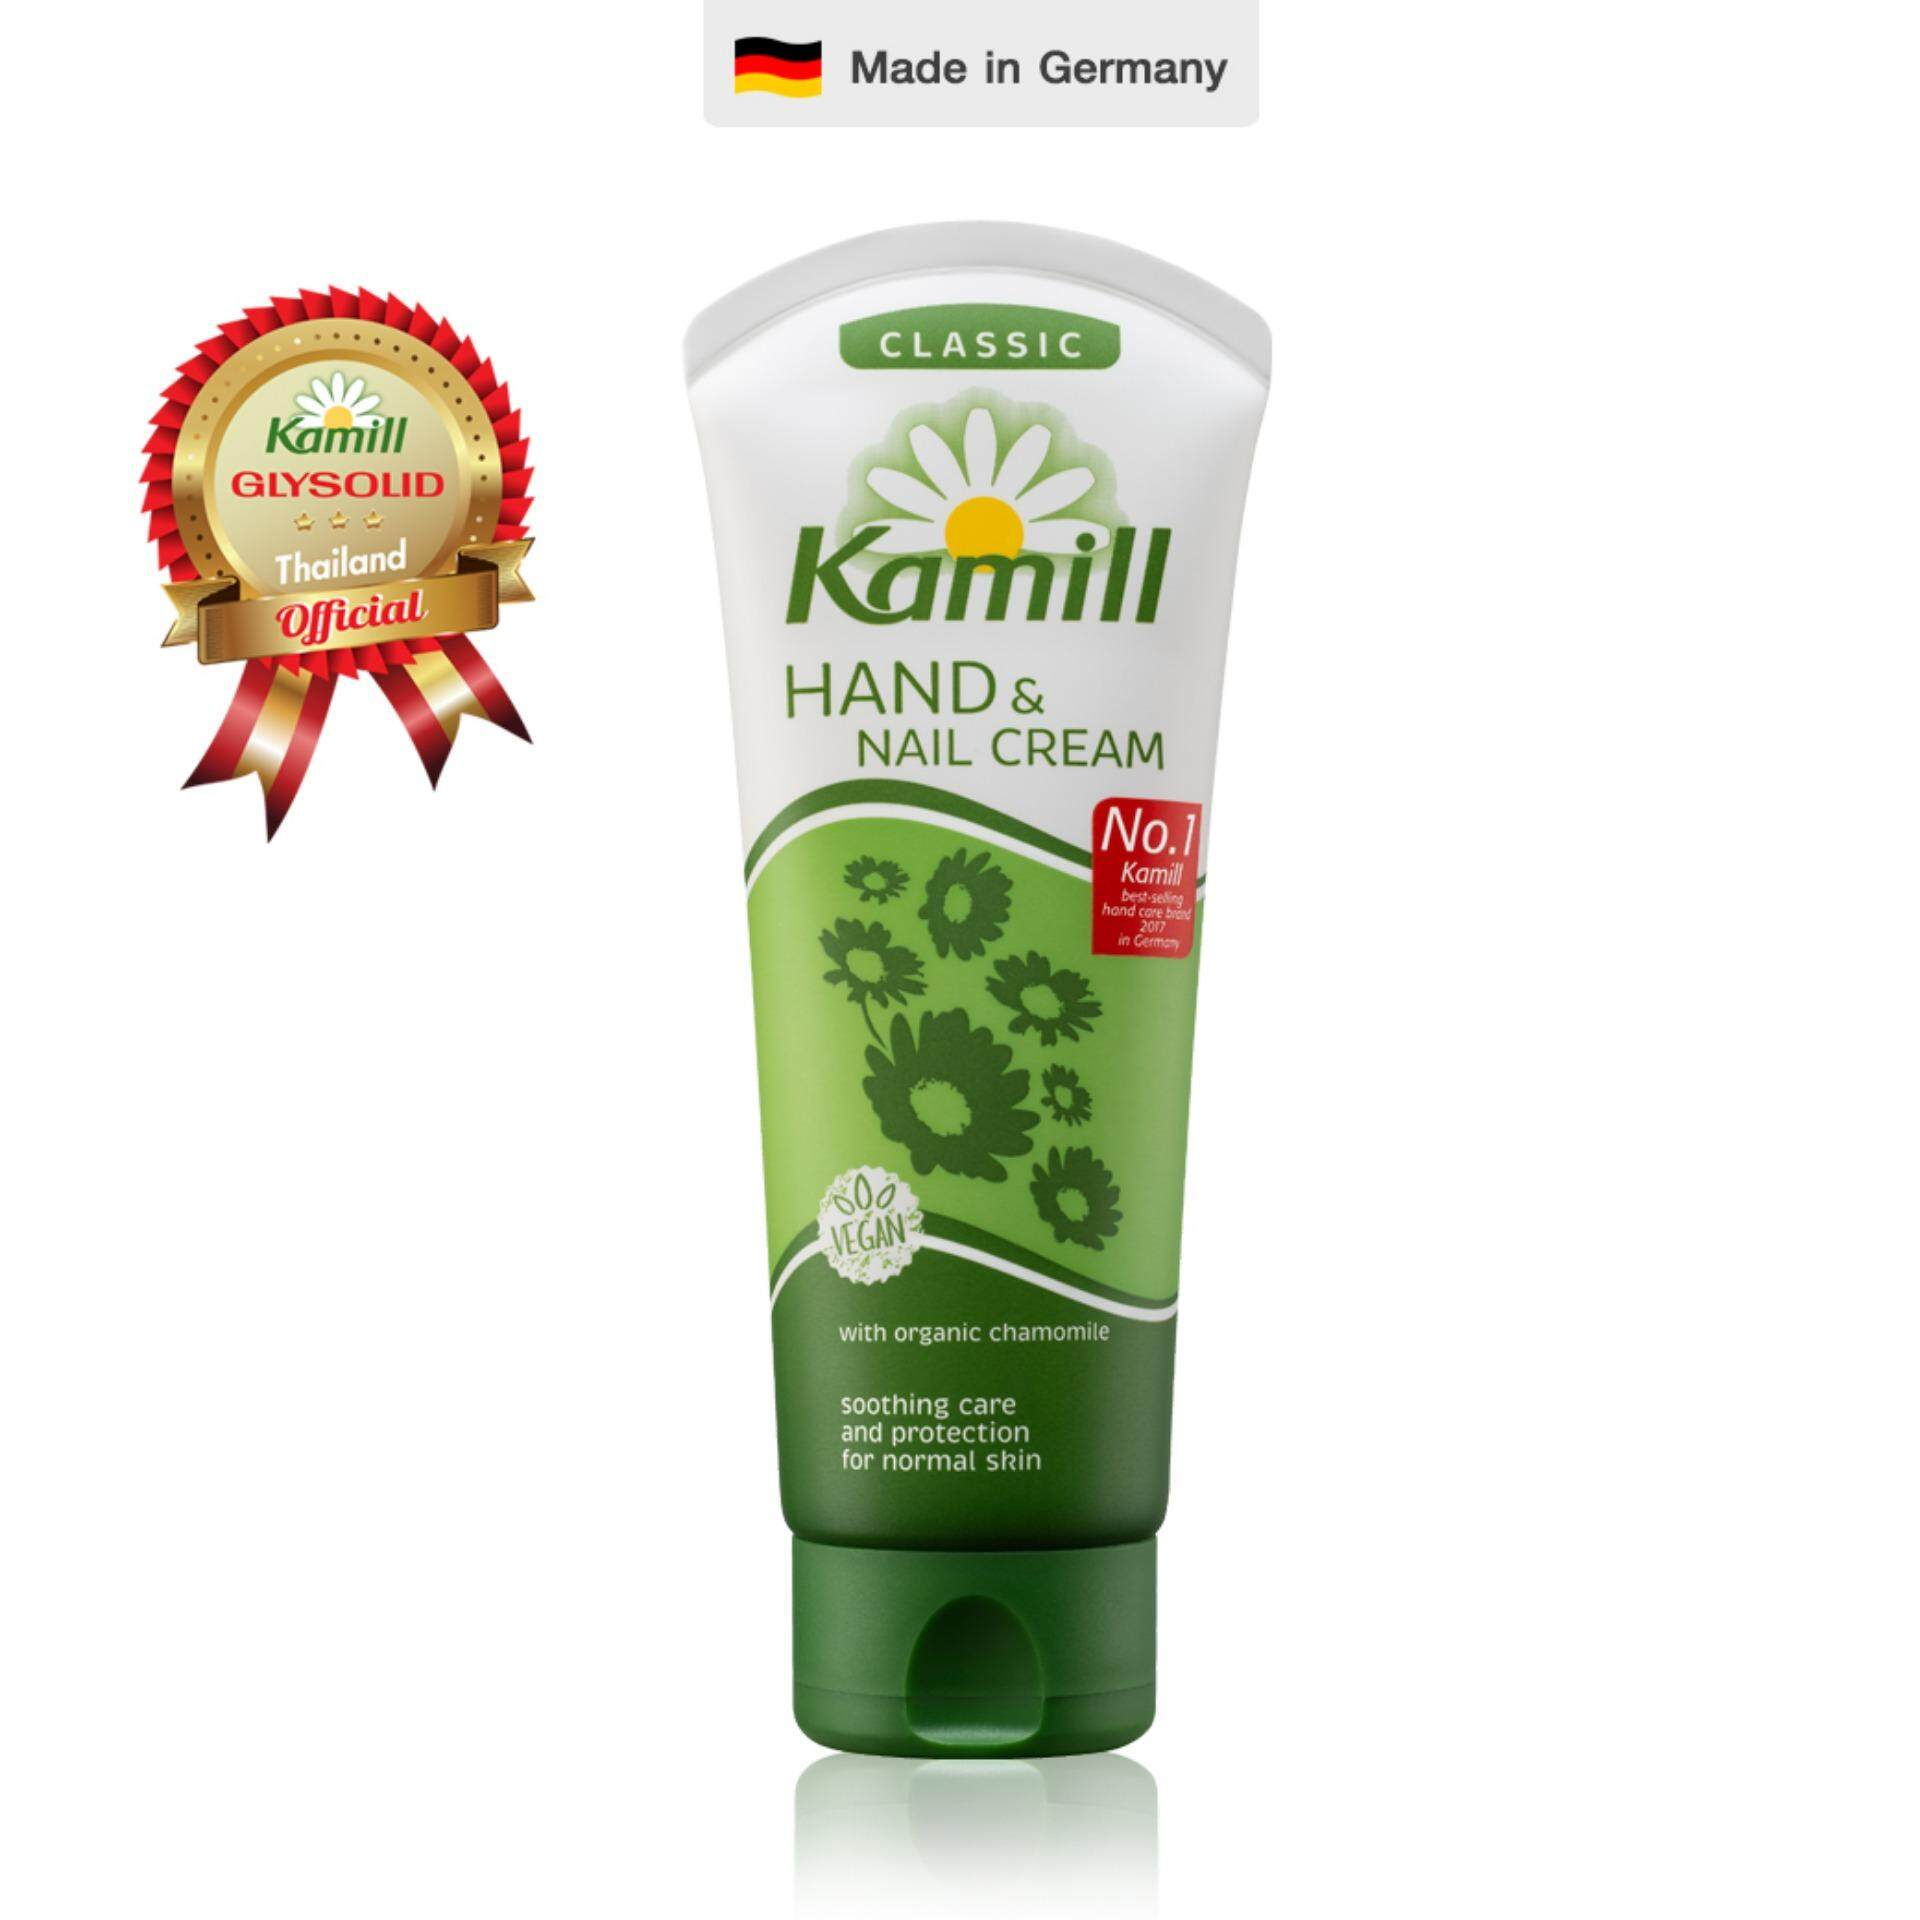 Kamill Hand & Nail Cream Classic (คามิล แฮนด์ แอนด์ เนล ครีม สูตร คลาสสิค 100 มล.)